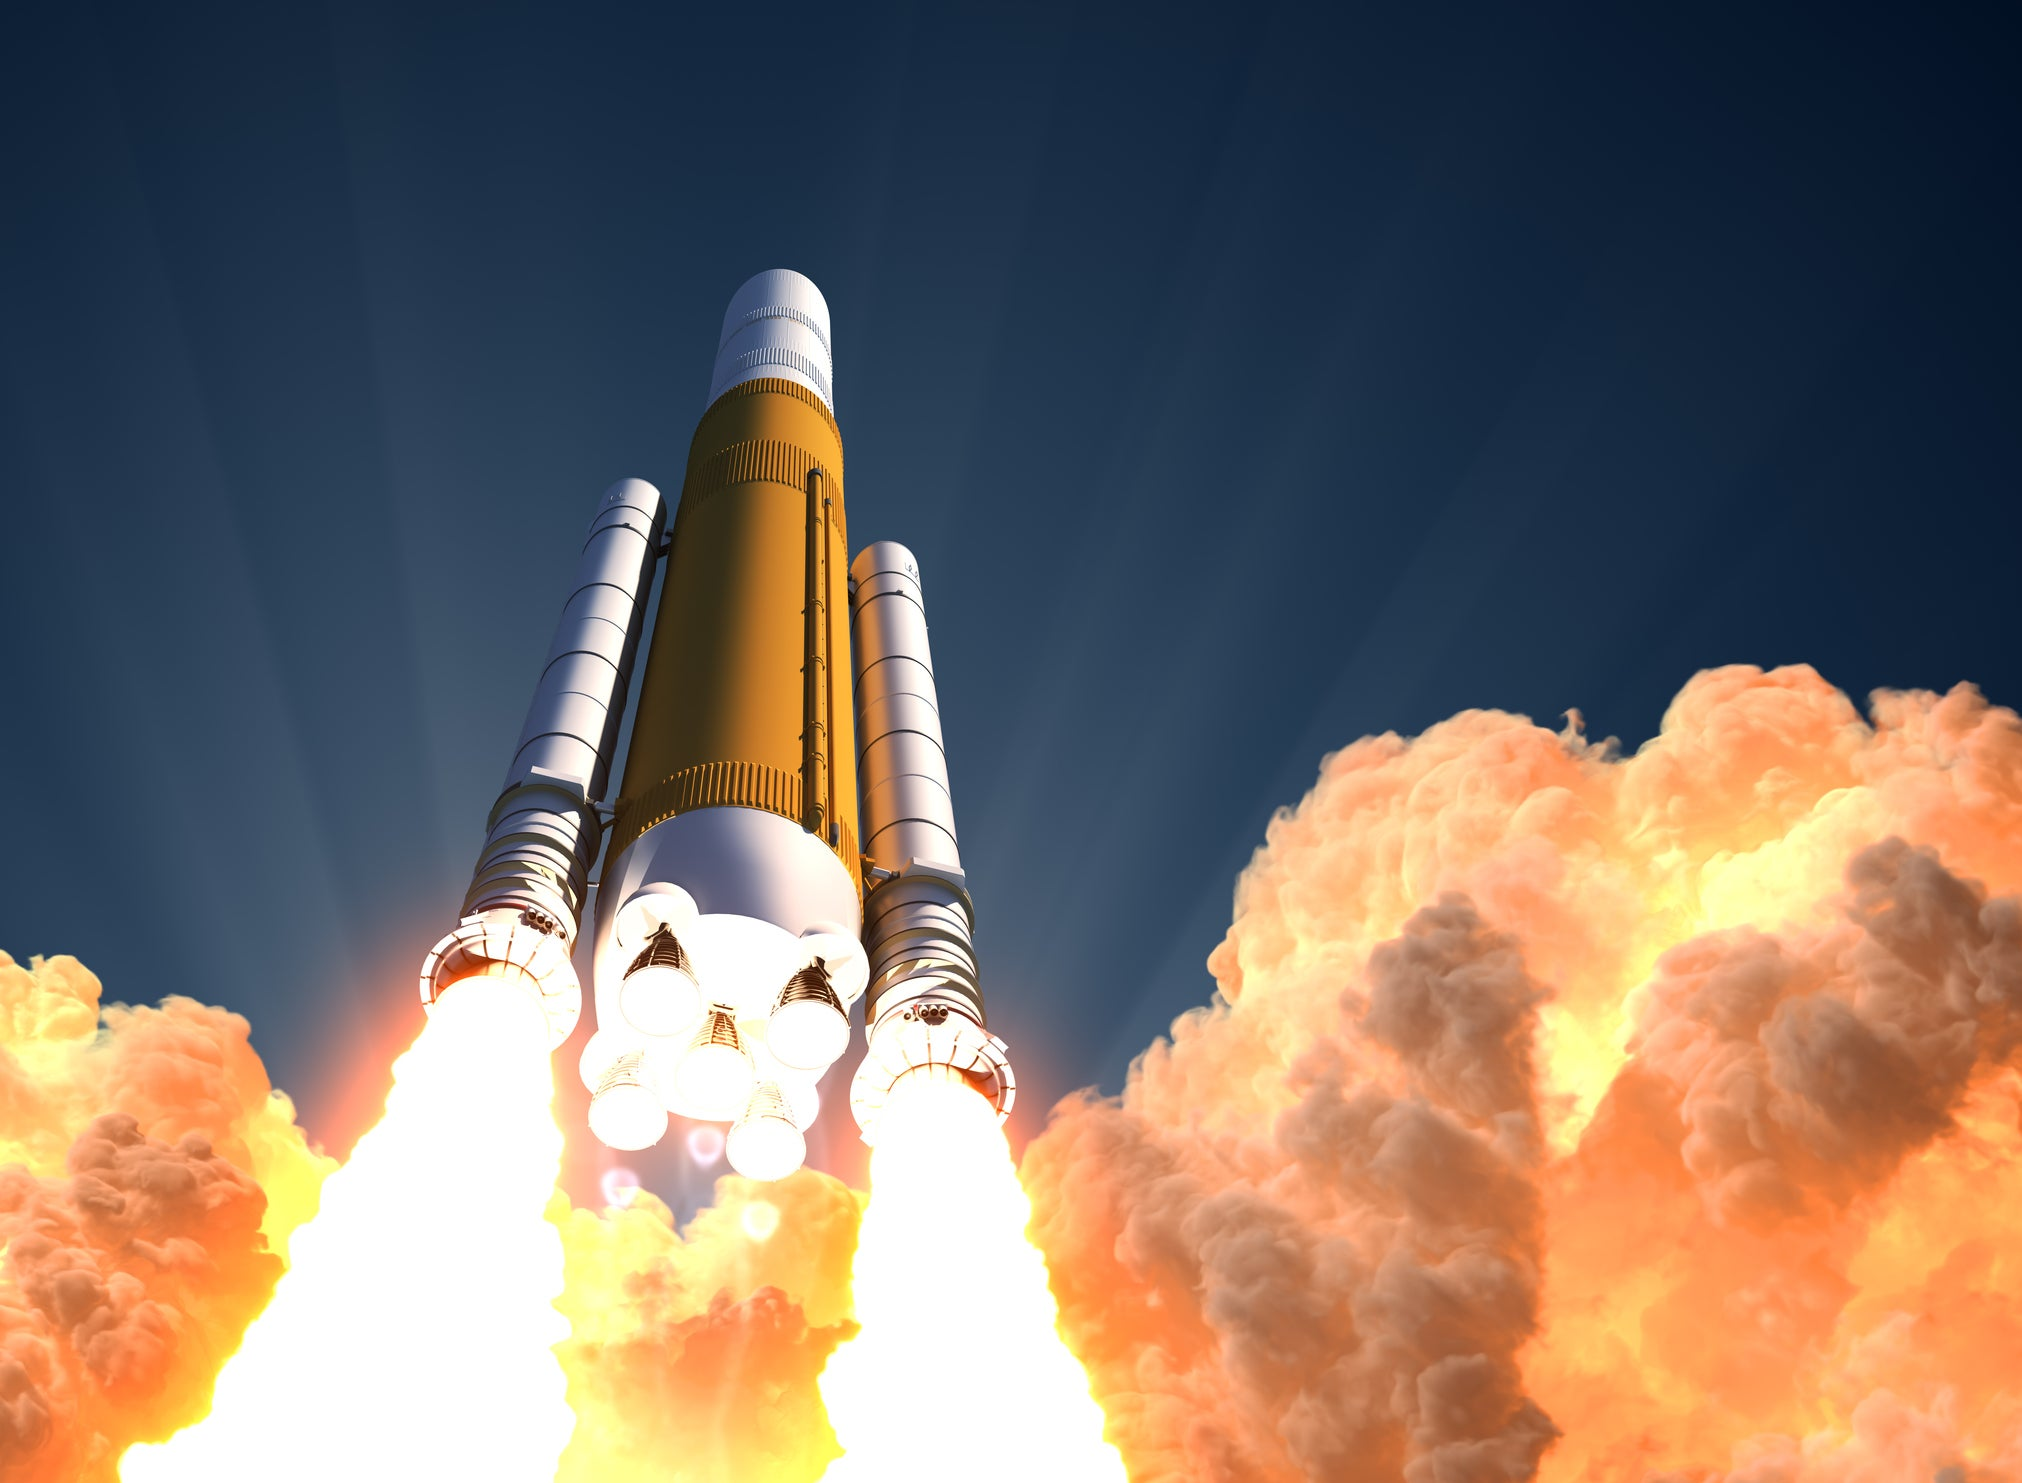 Rocket launching from below